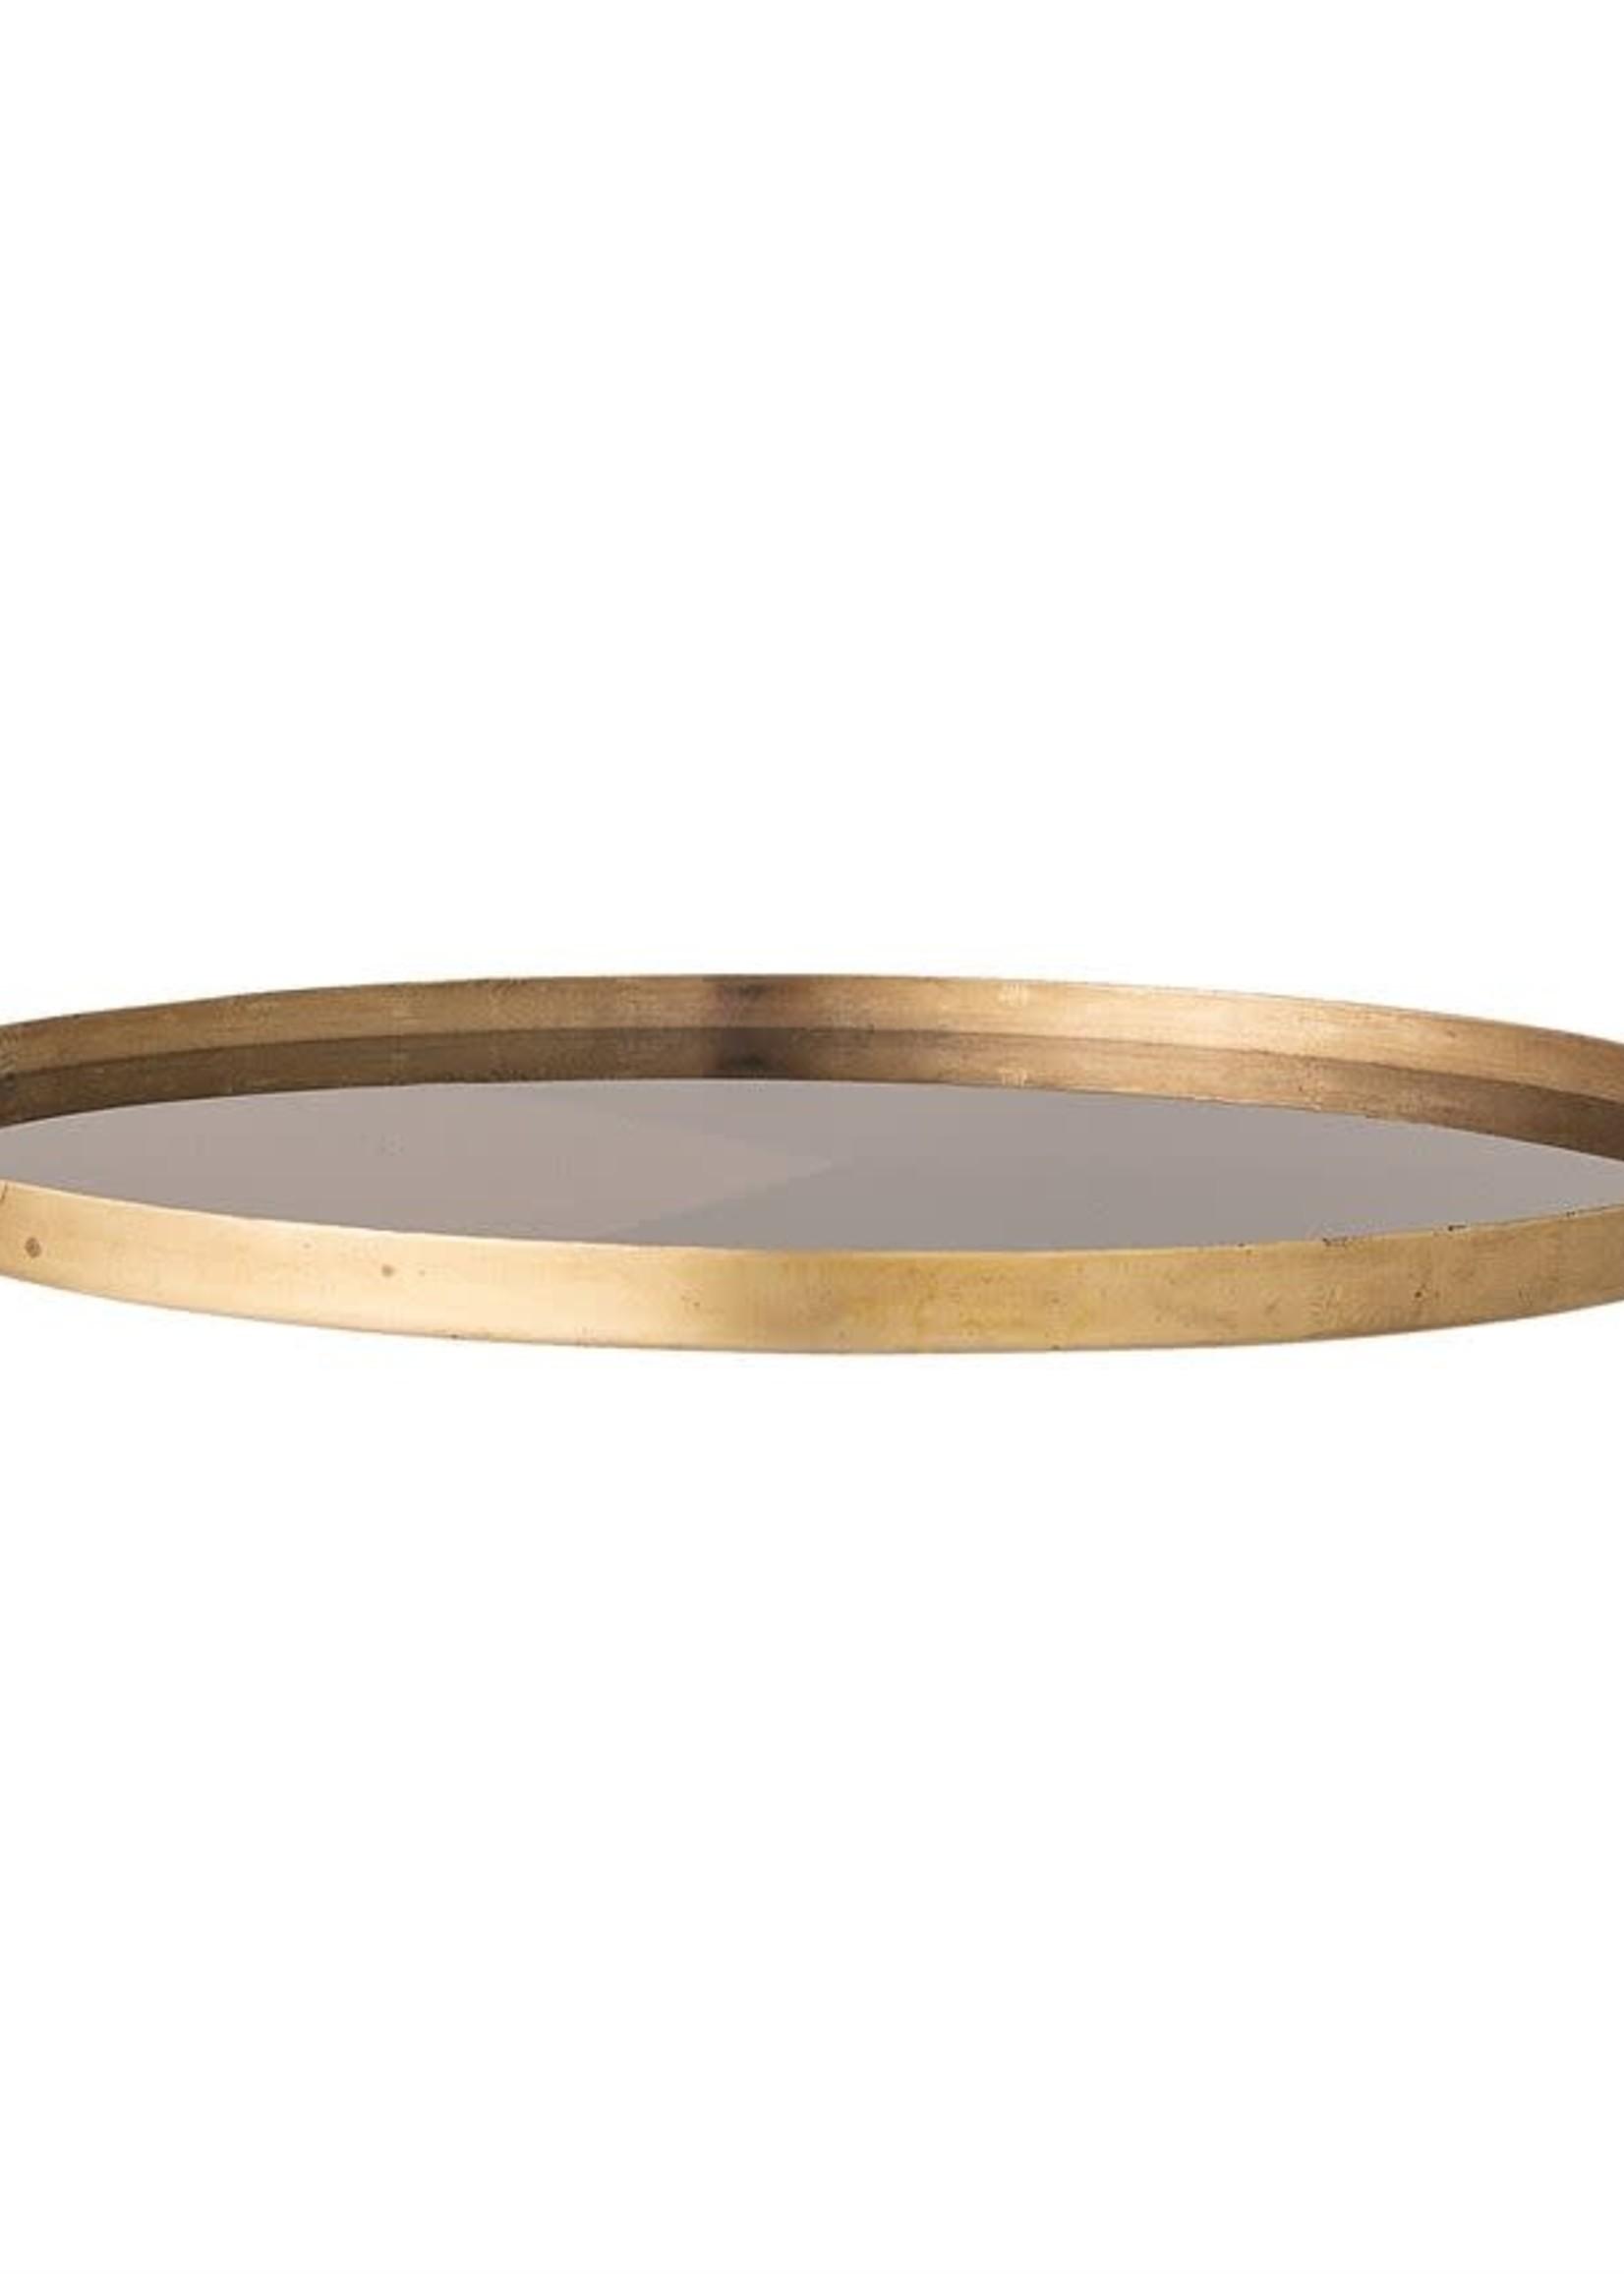 Round Decorative Metal & Glass Tray, Navy, Black & Antique Copper Finish